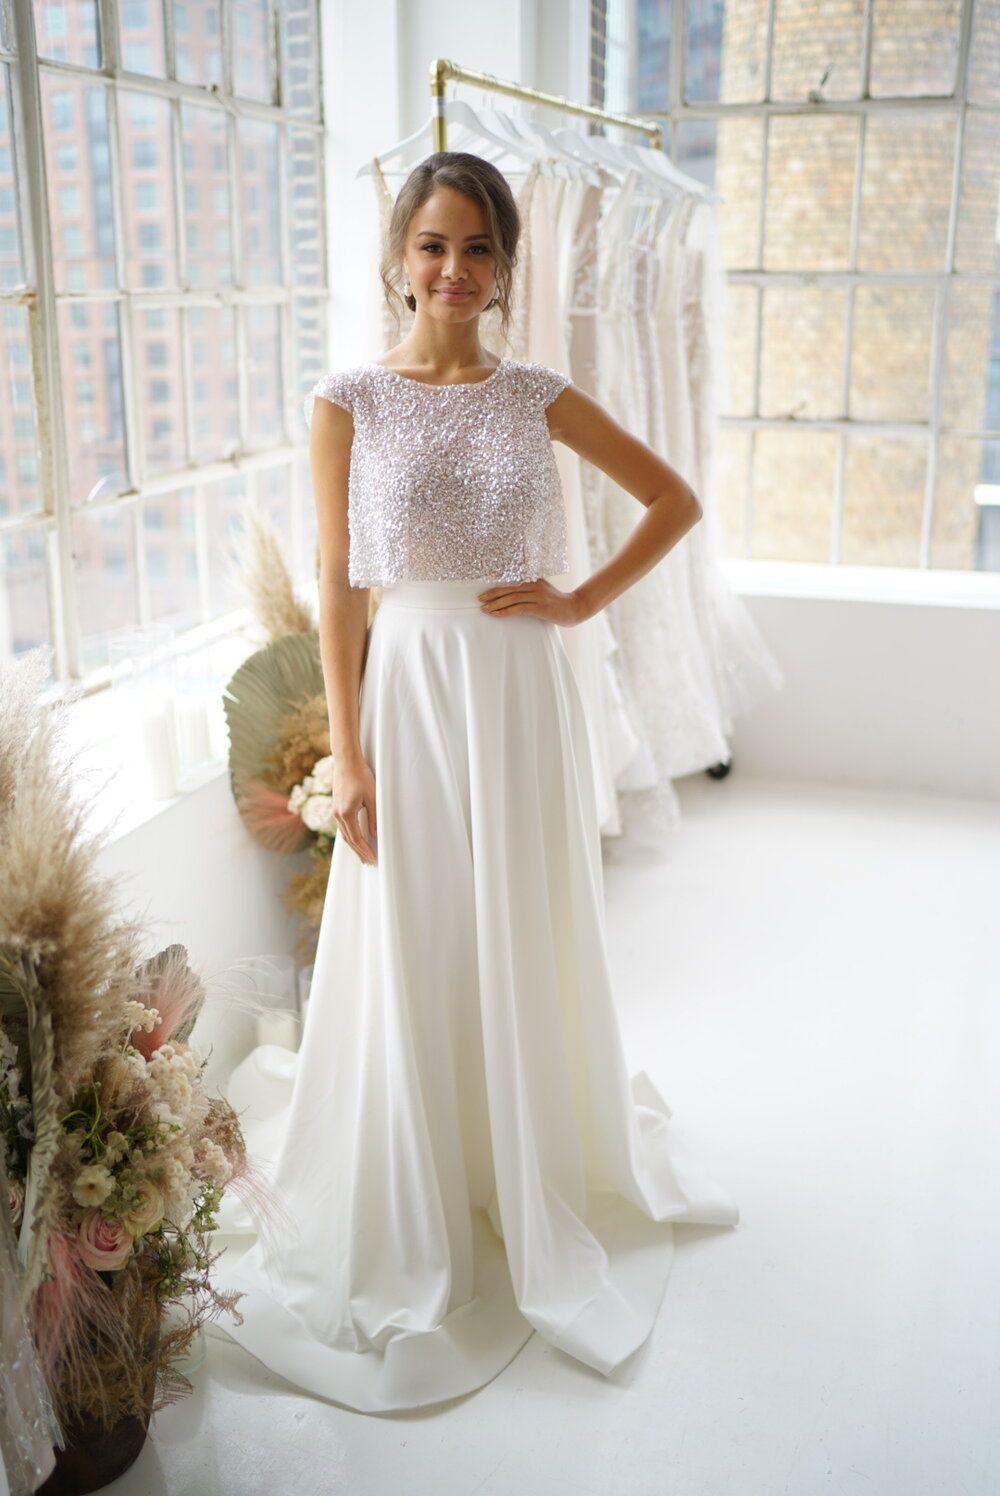 Ava Separate Skirt Anna Campbell Two Piece Wedding Dress Wedding Dresses Bridal Separates [ 1496 x 1000 Pixel ]